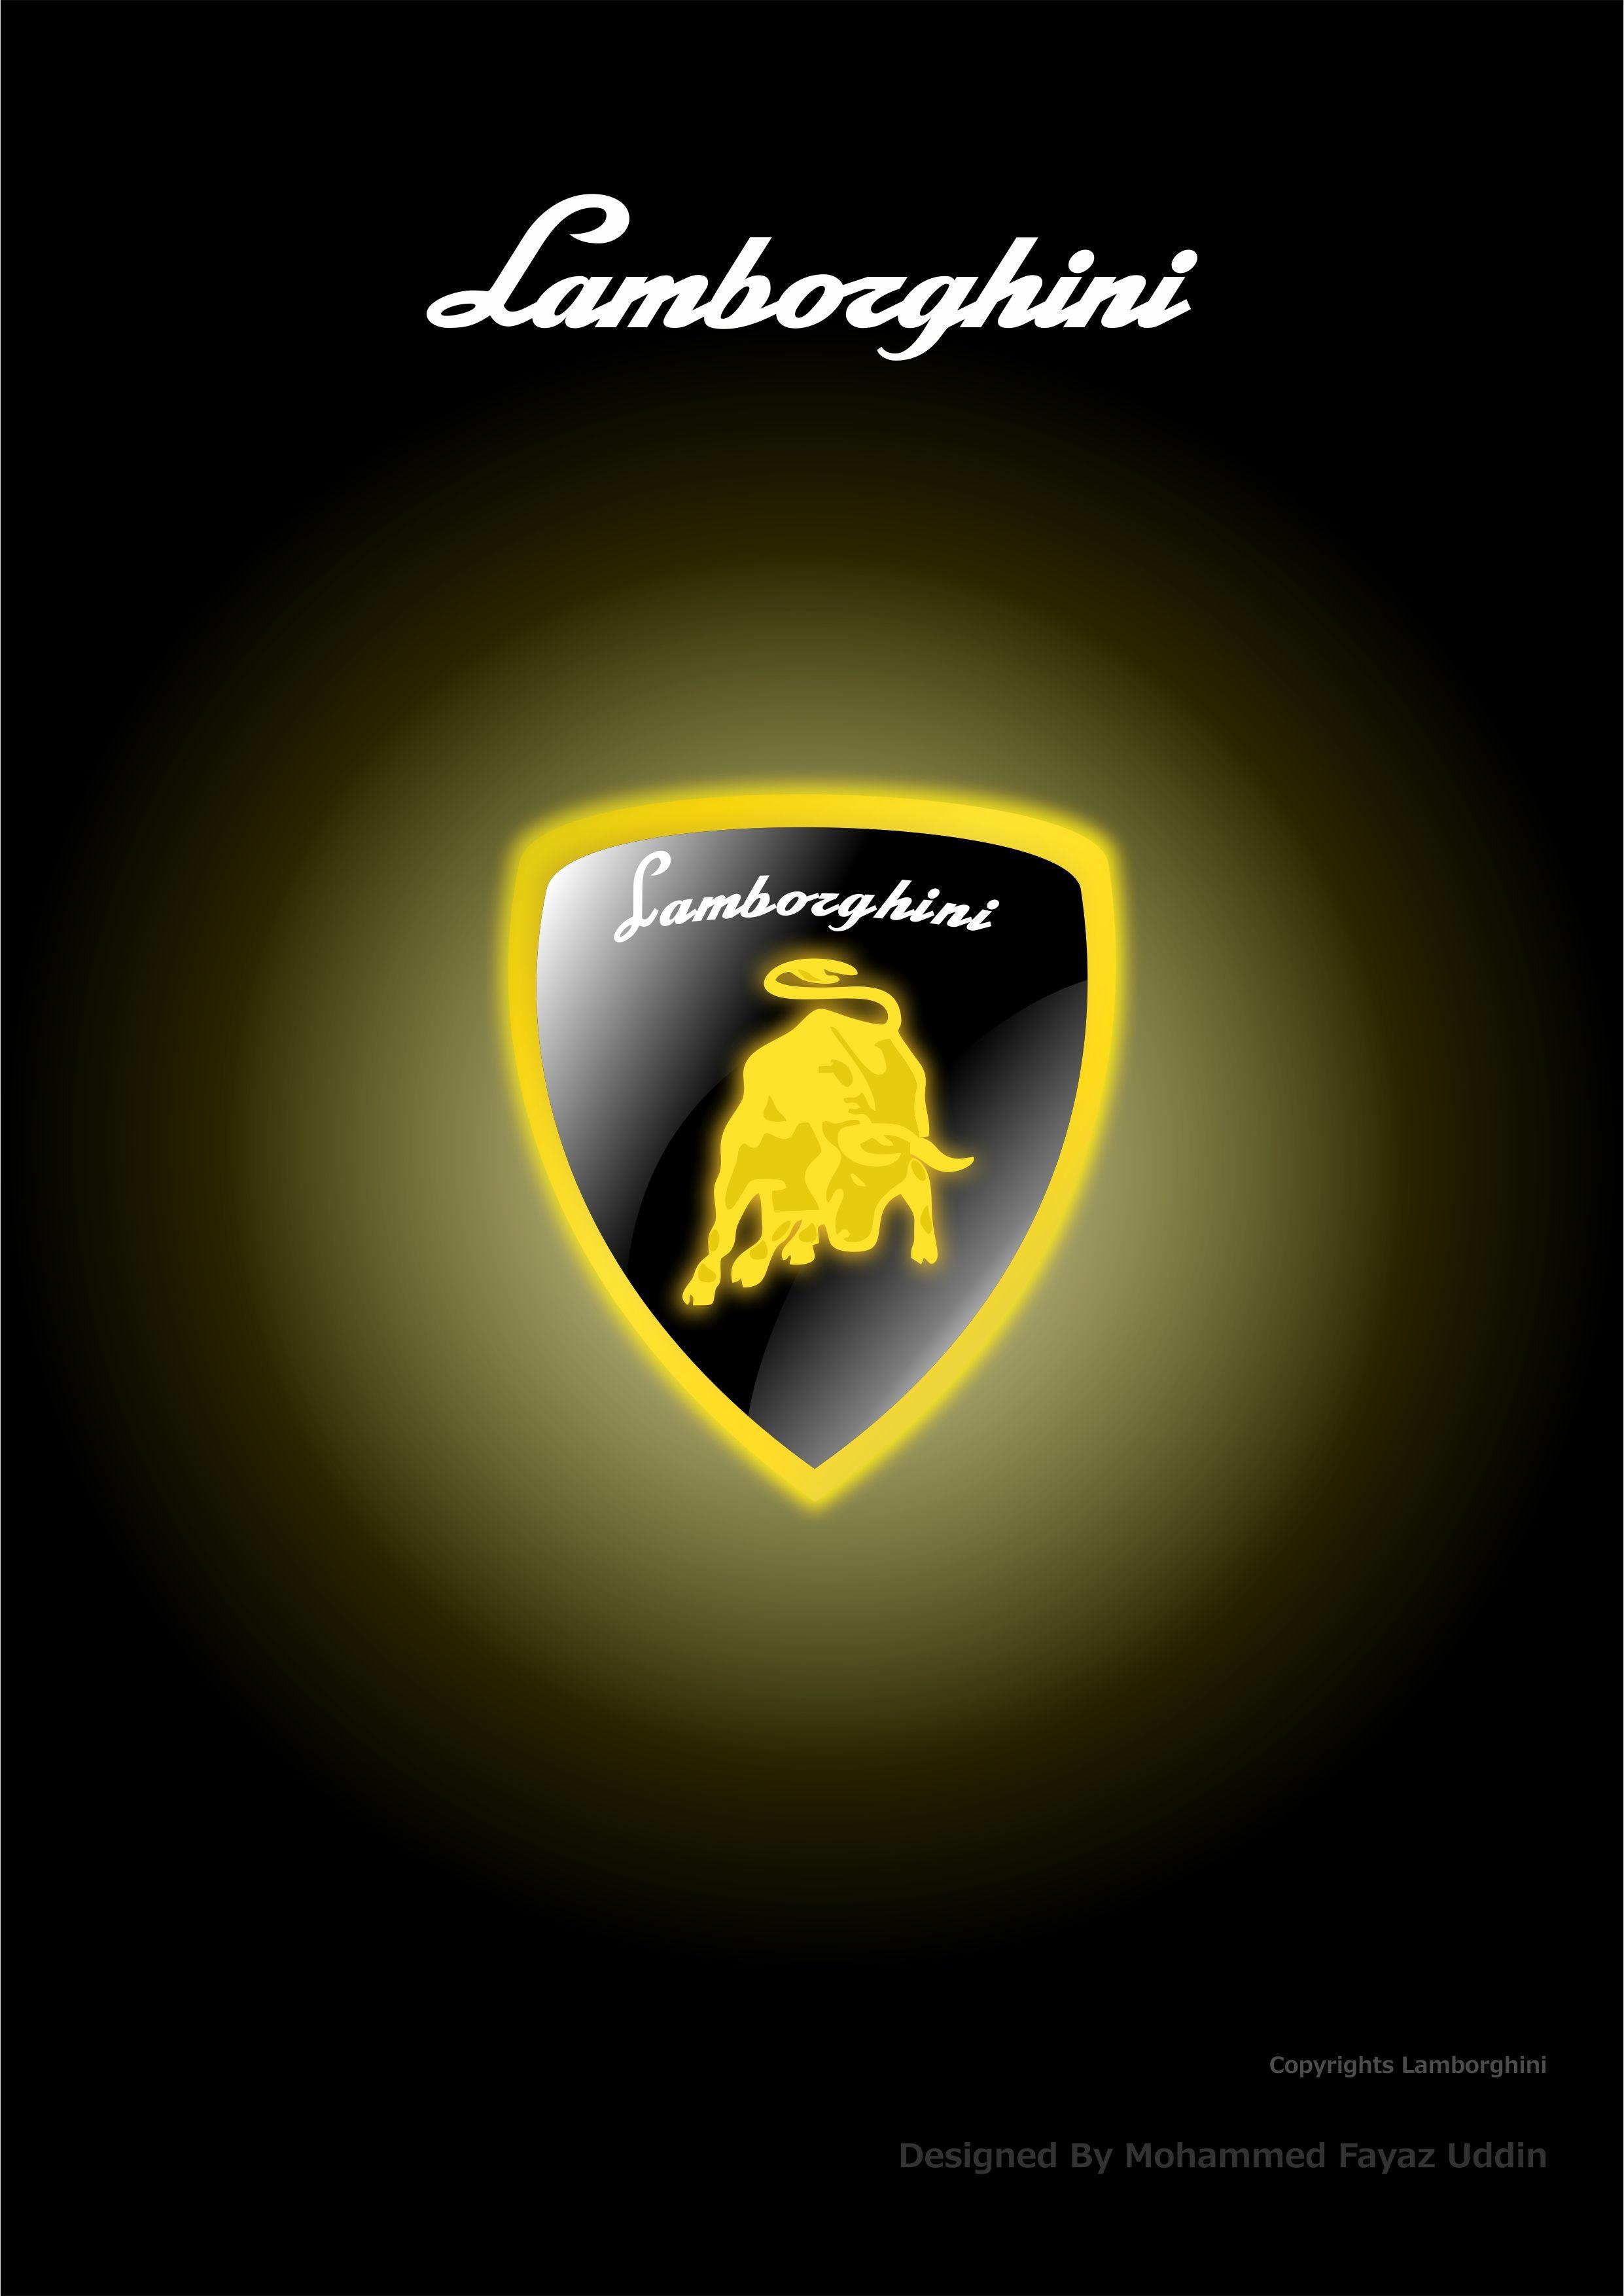 Lamborghini Logo Hd Wallpaper For Iphone Samsung Nokia Mi